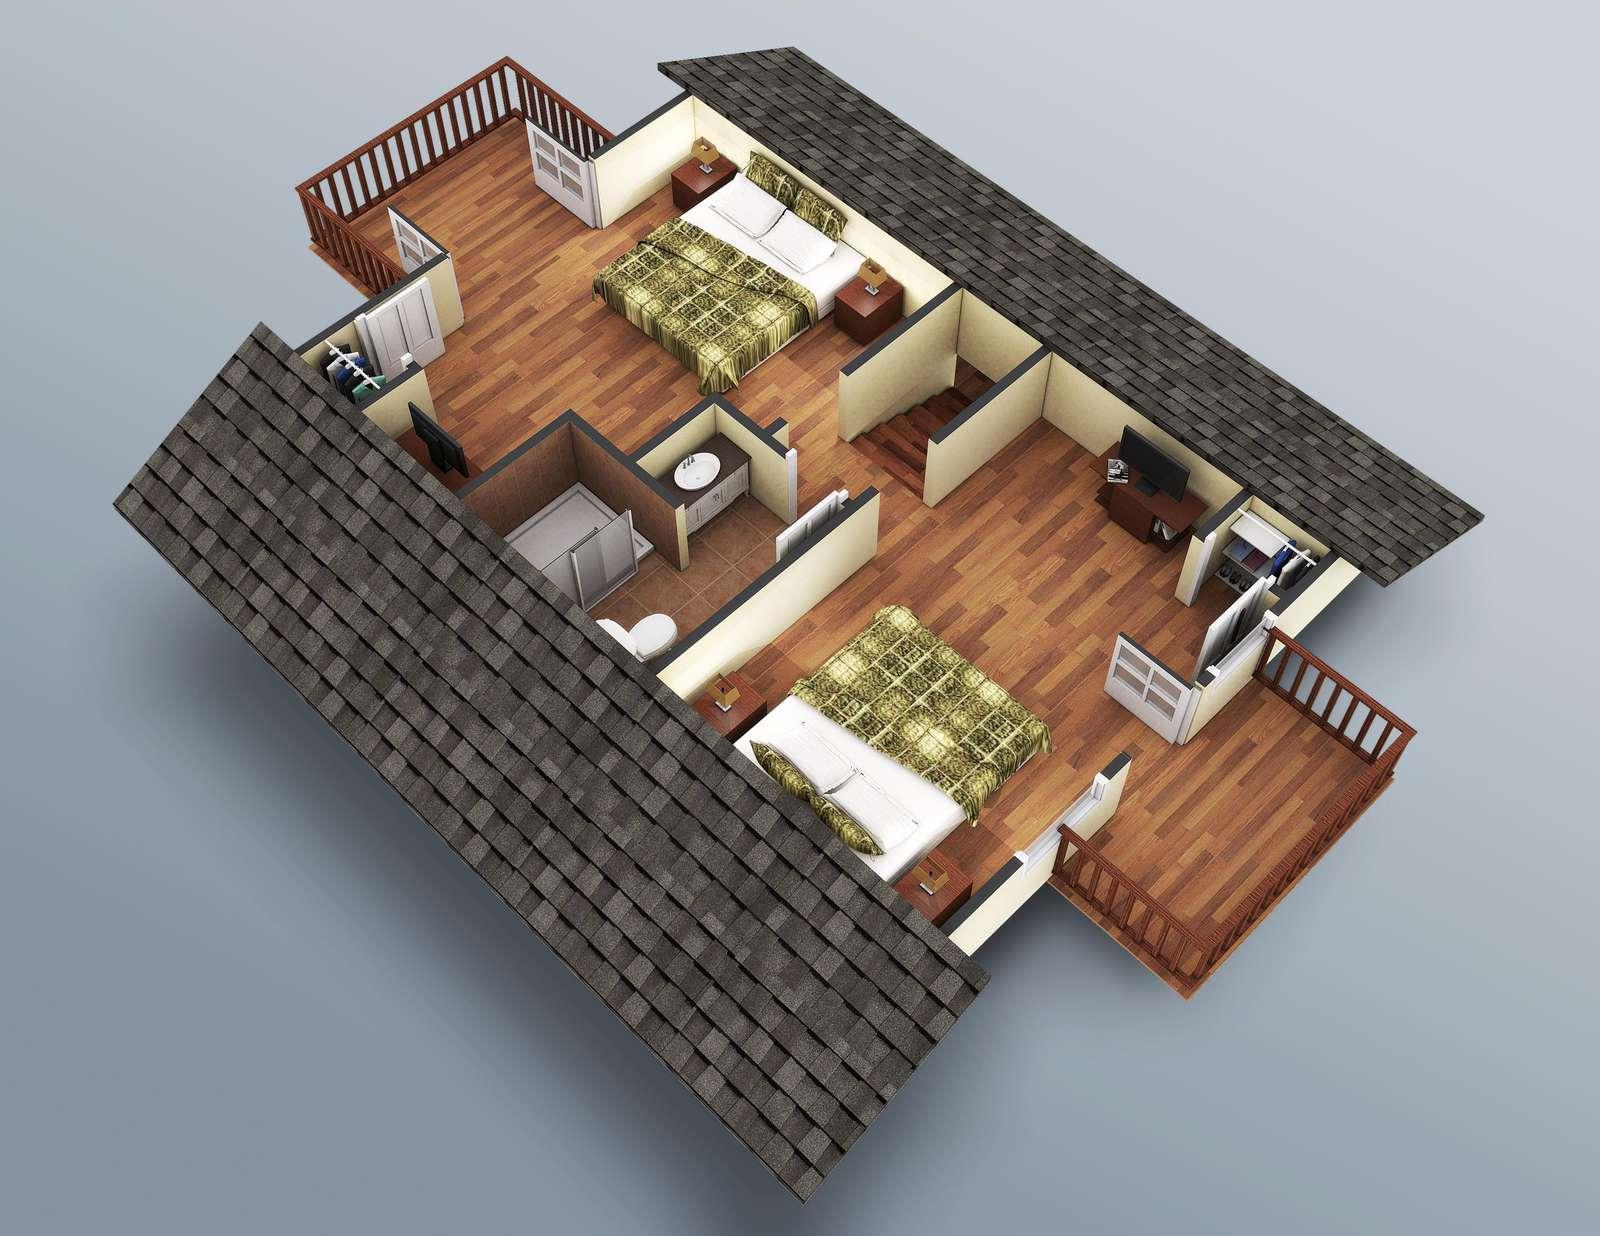 The Upstairs rendering.